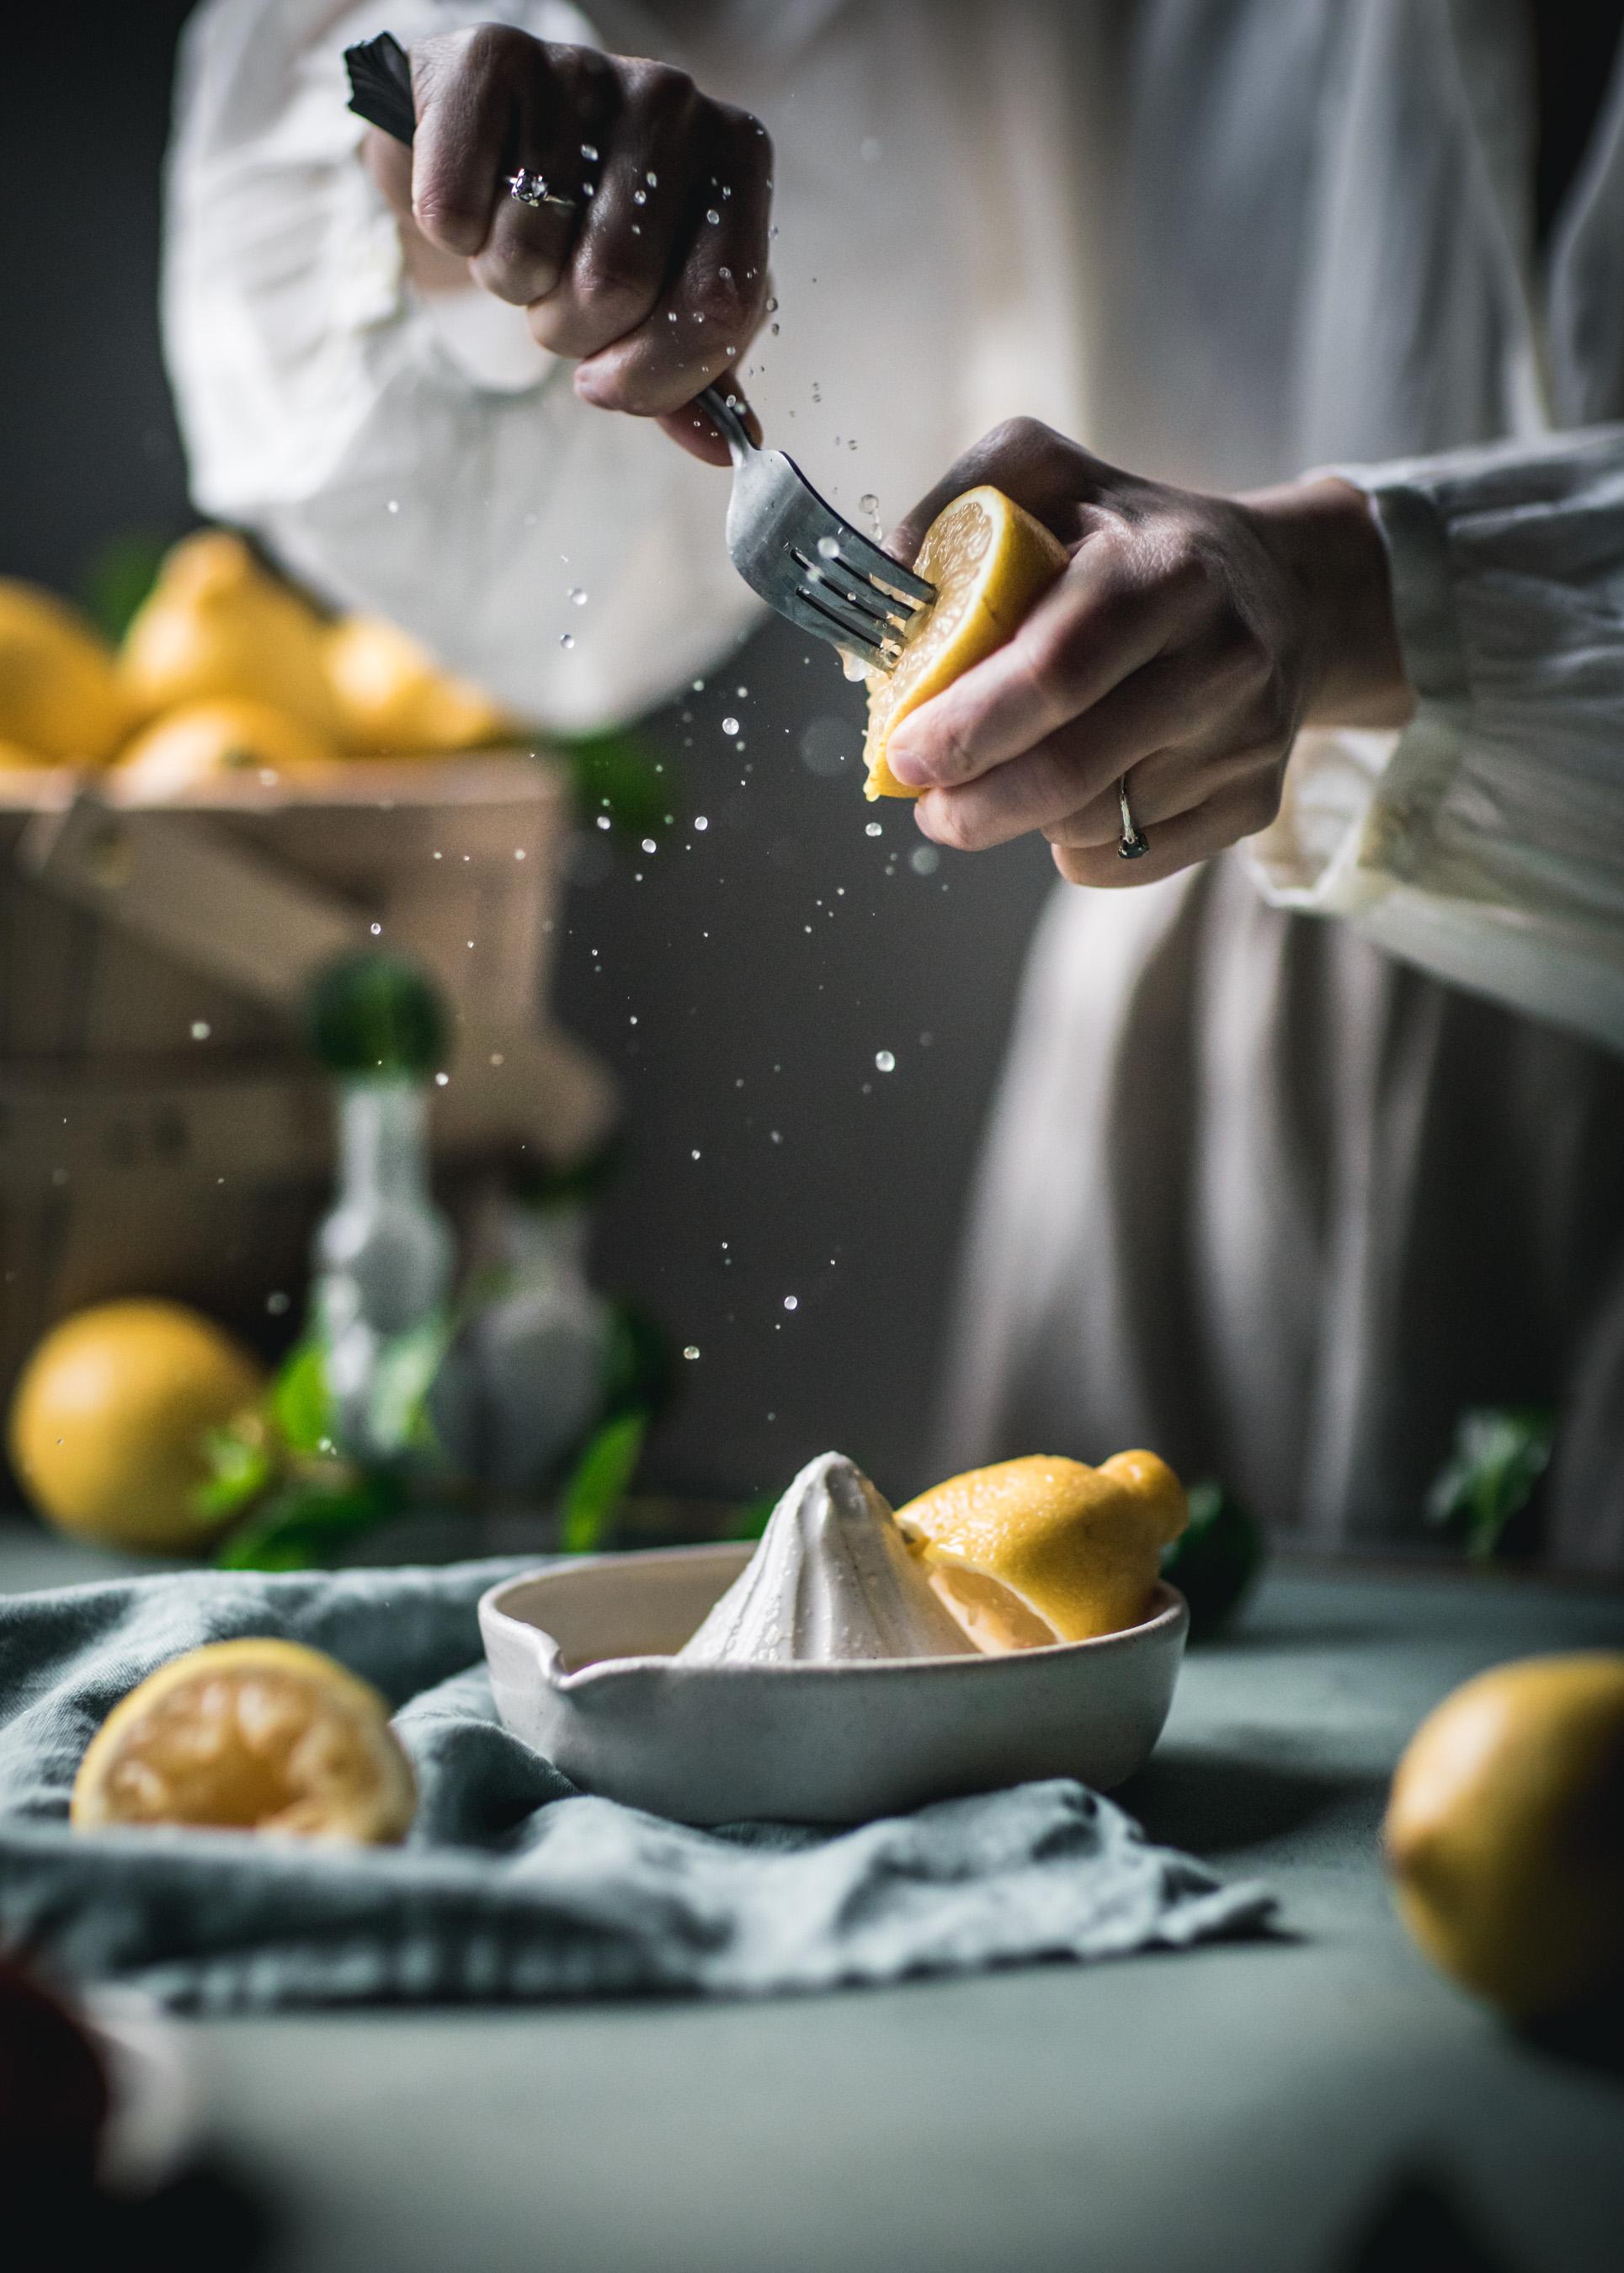 Lemon Juicing Food Photography